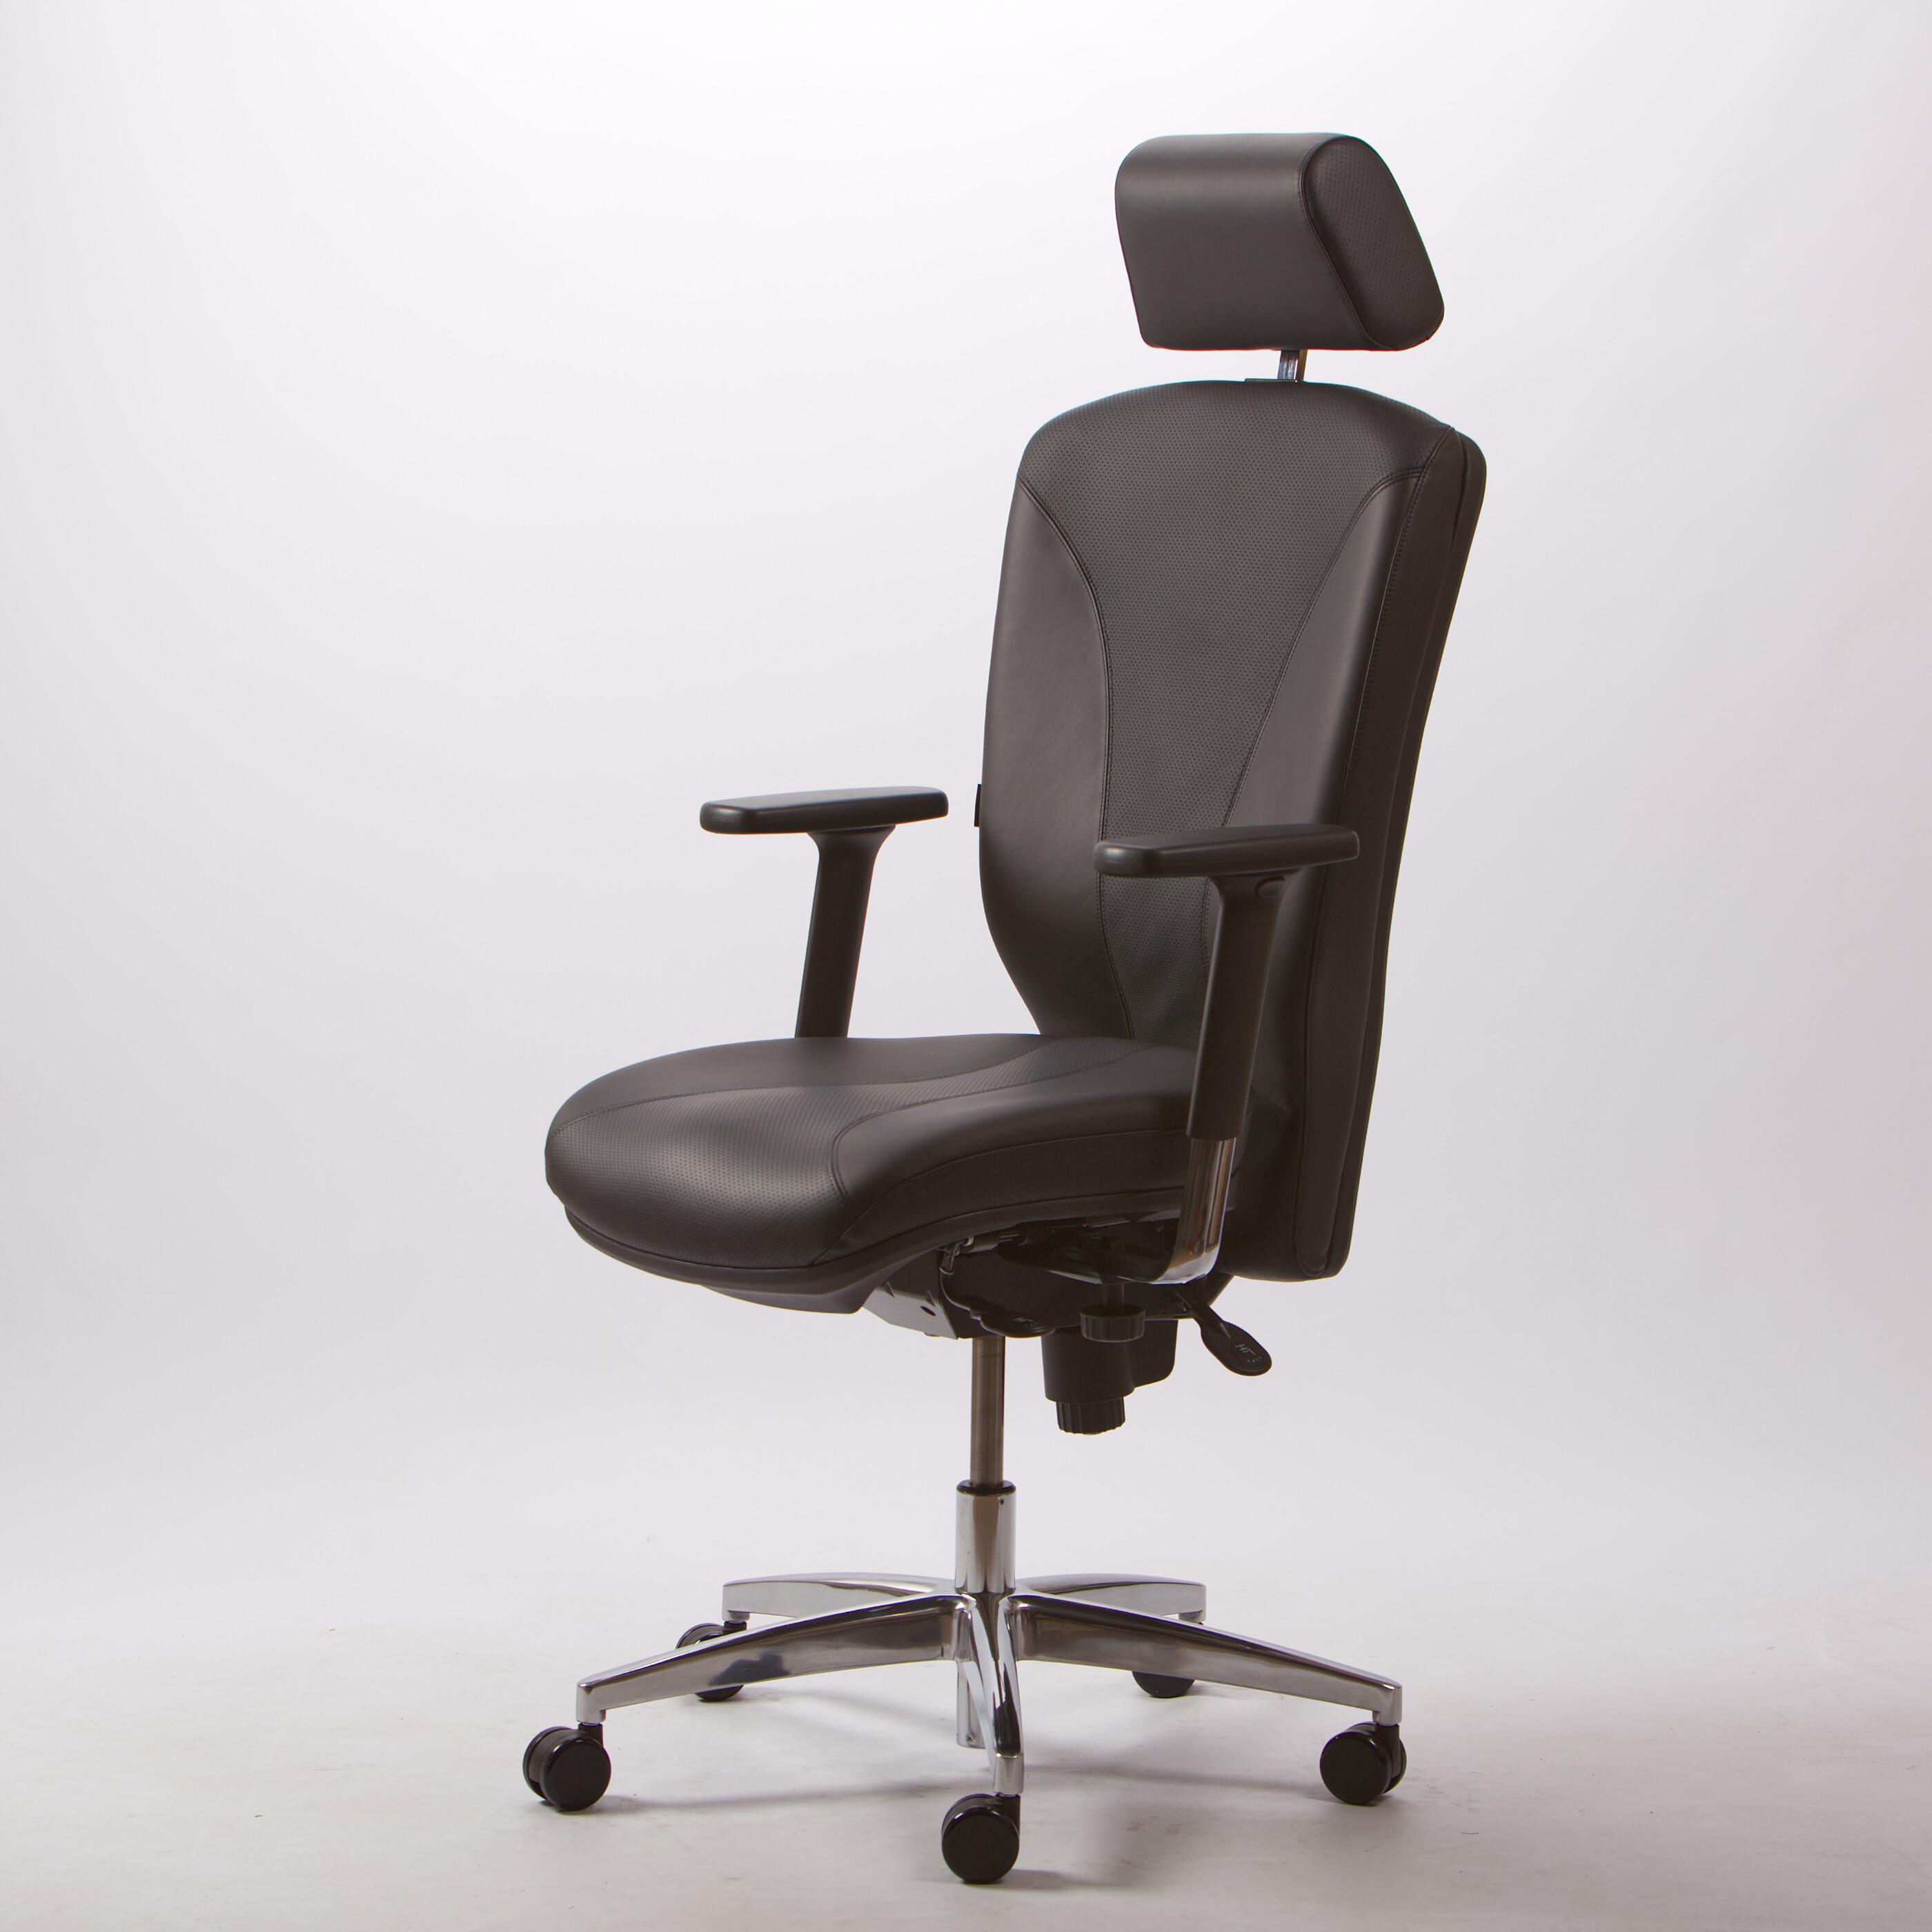 TERGON Bürostuhl T6.0 XL Ergoprotection 02